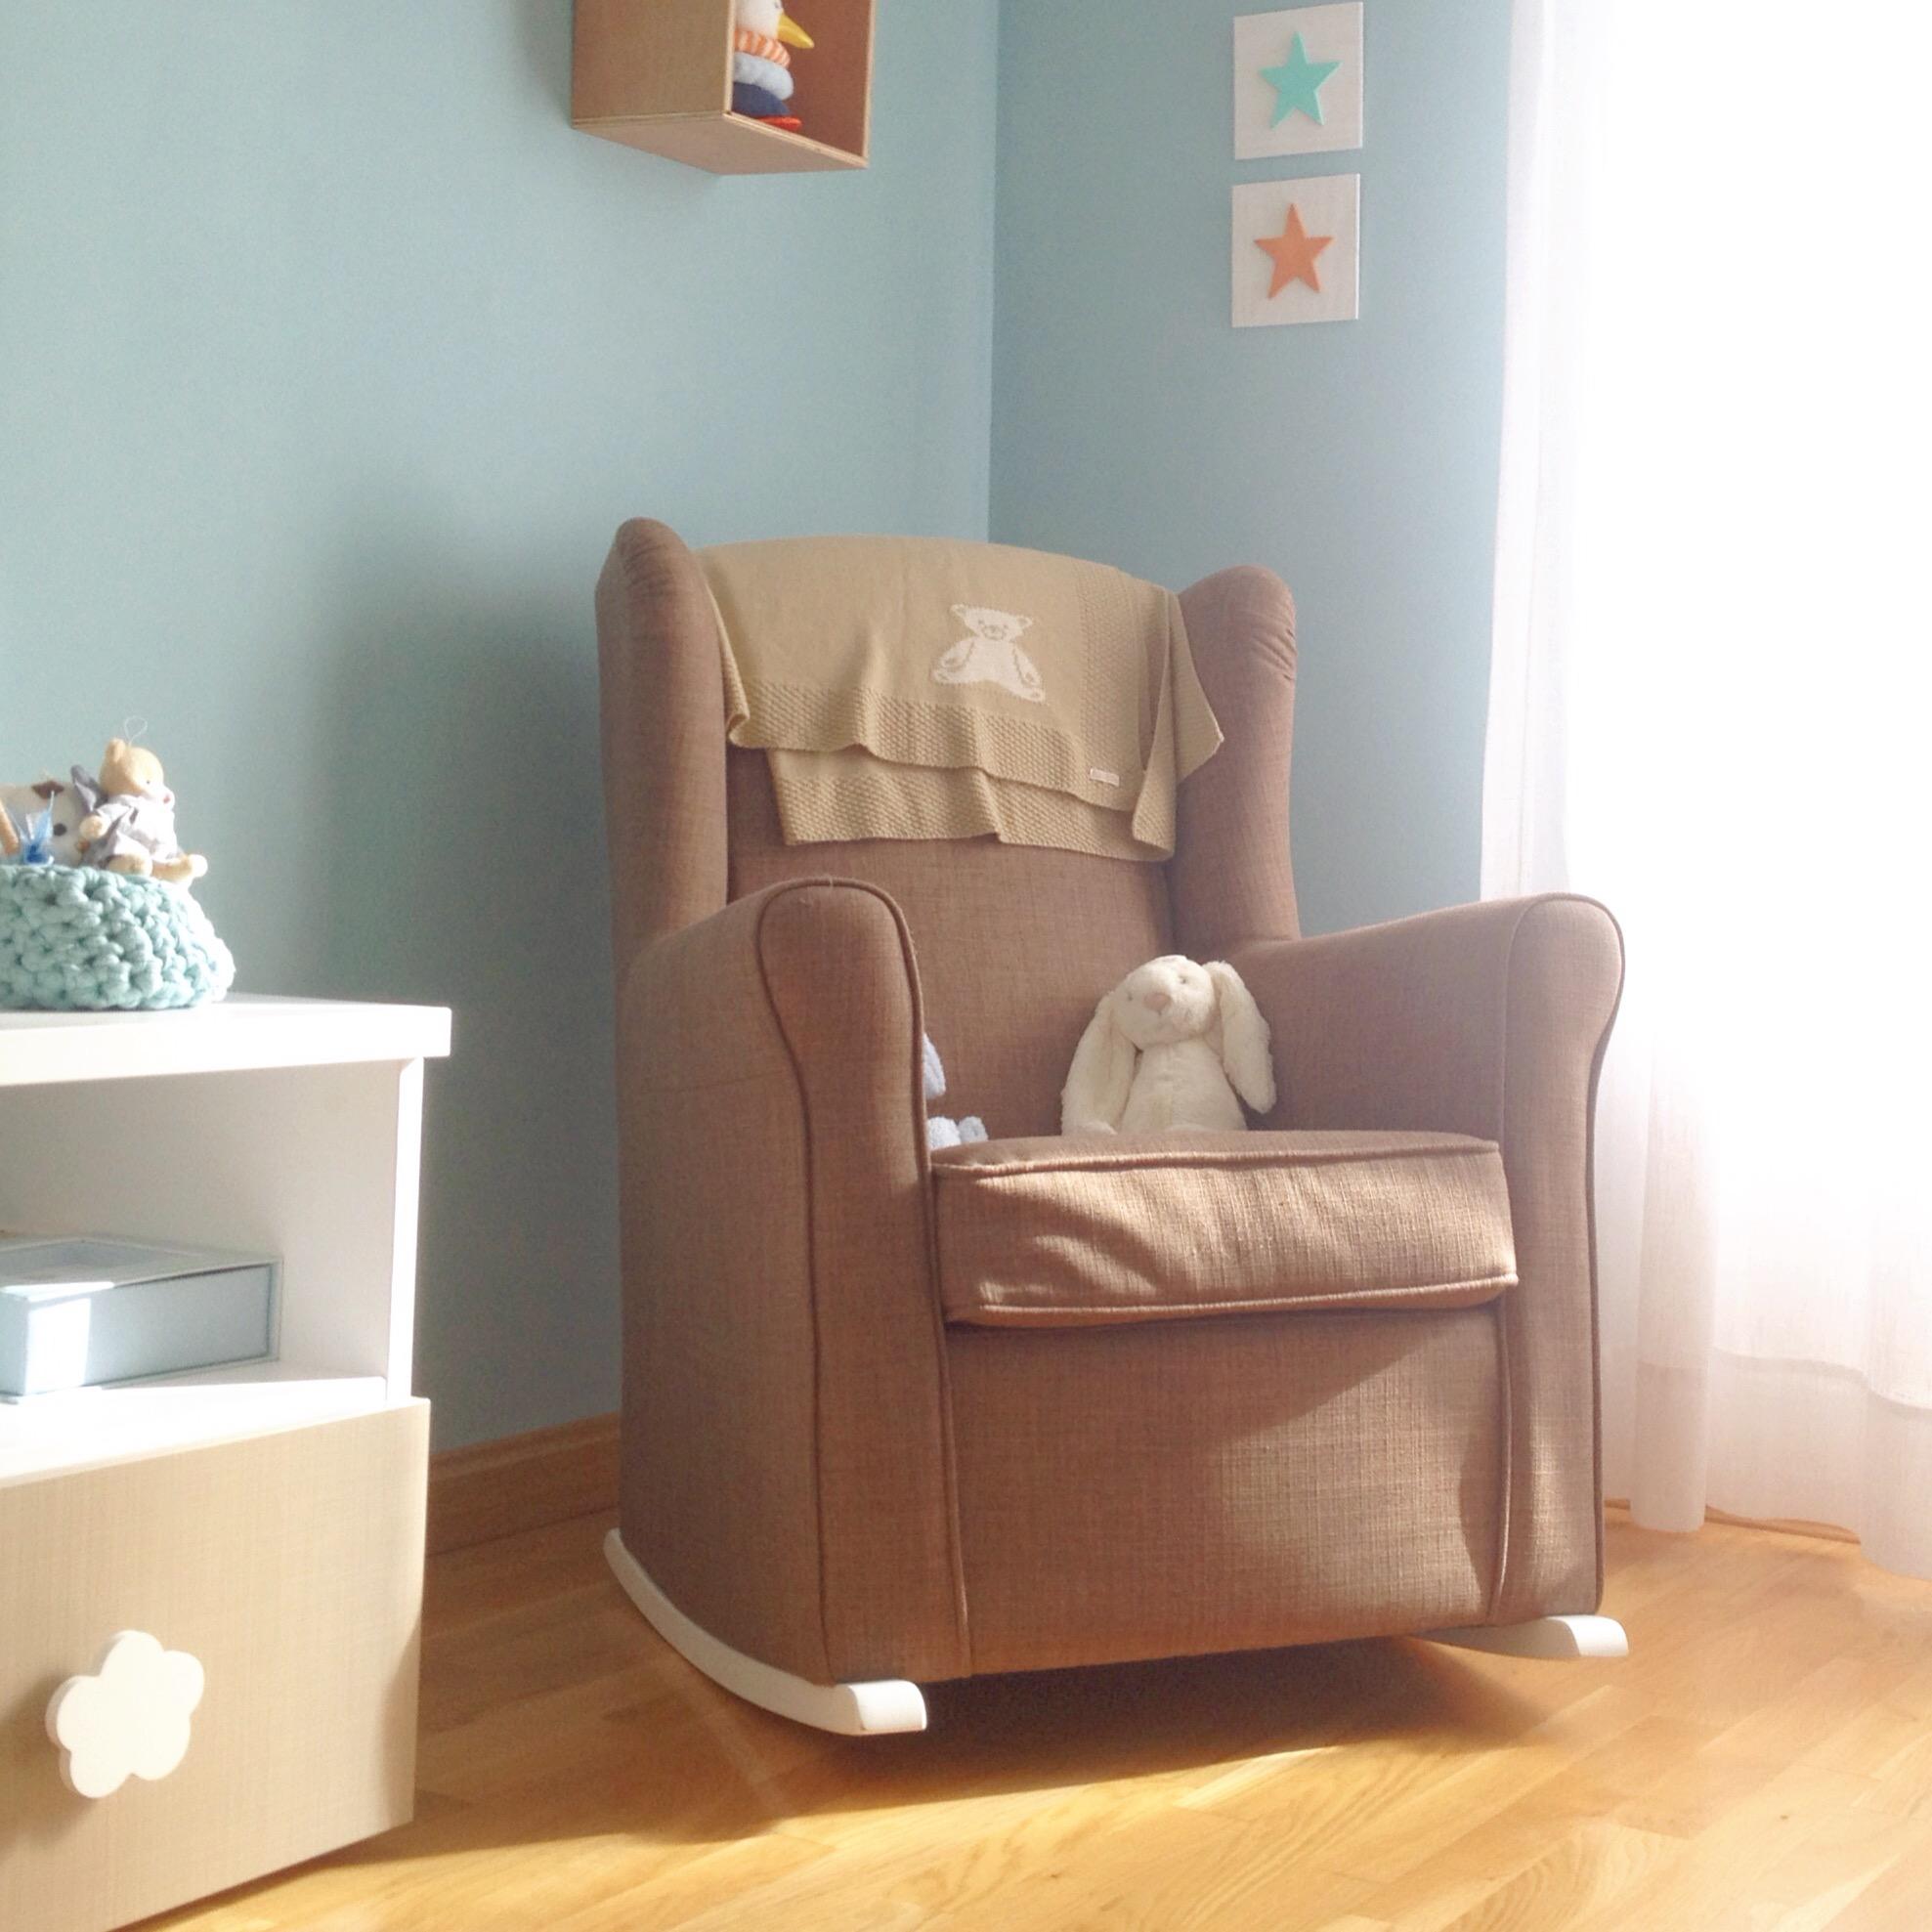 Ikea butacas y sillones nueva coleccin stockholm de ikea silla redonda sillas para exterior - Sofa lactancia ...